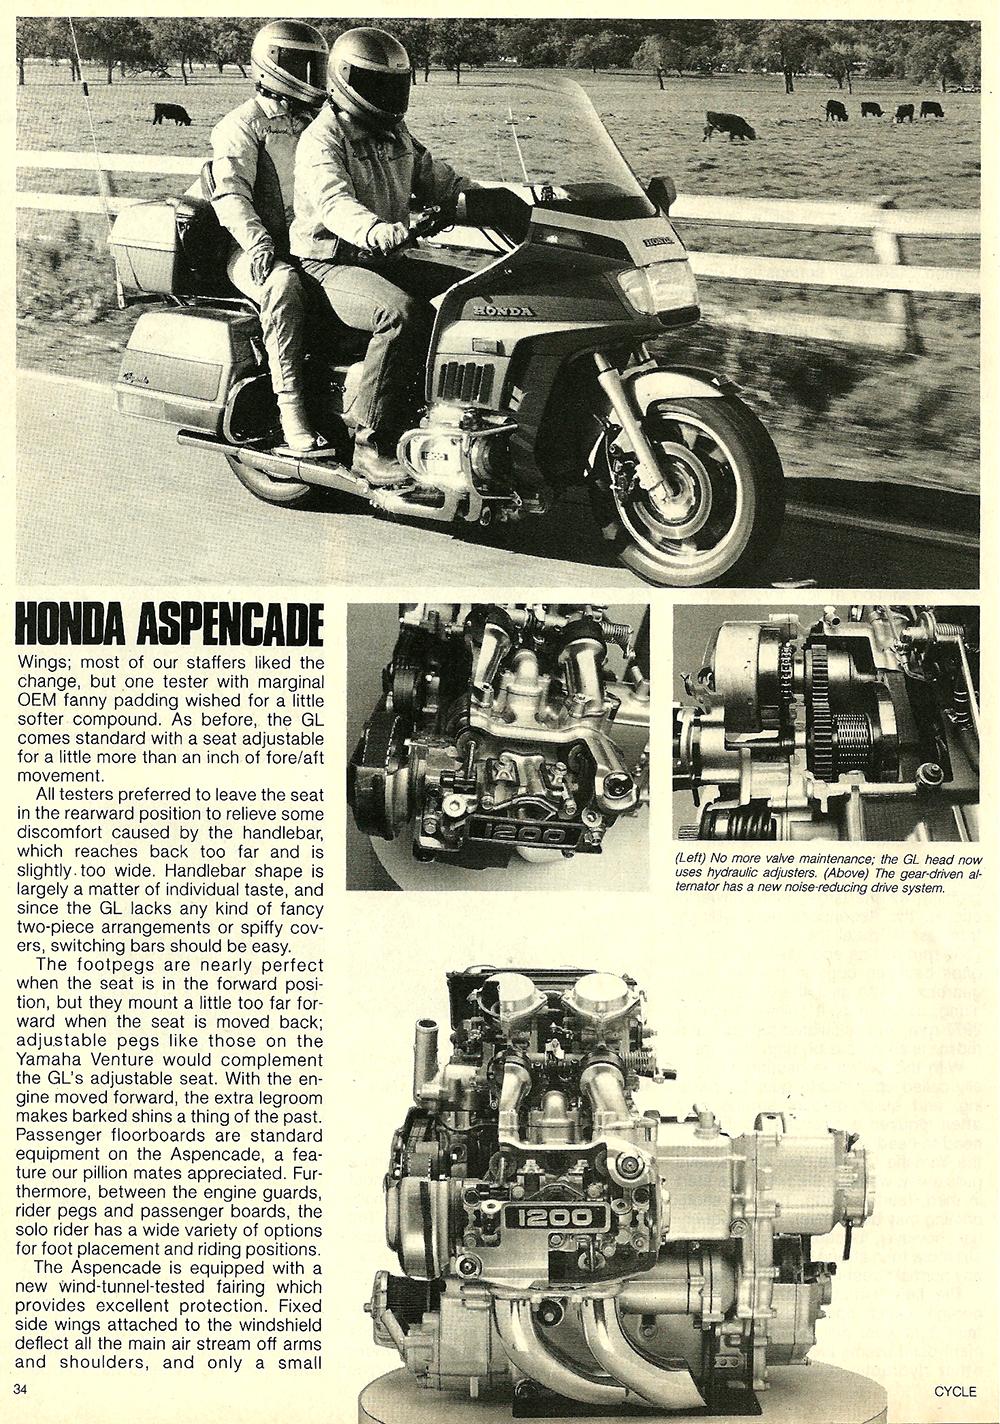 1984 Honda GL1200A Gold Wing Aspencade road test 7.jpg